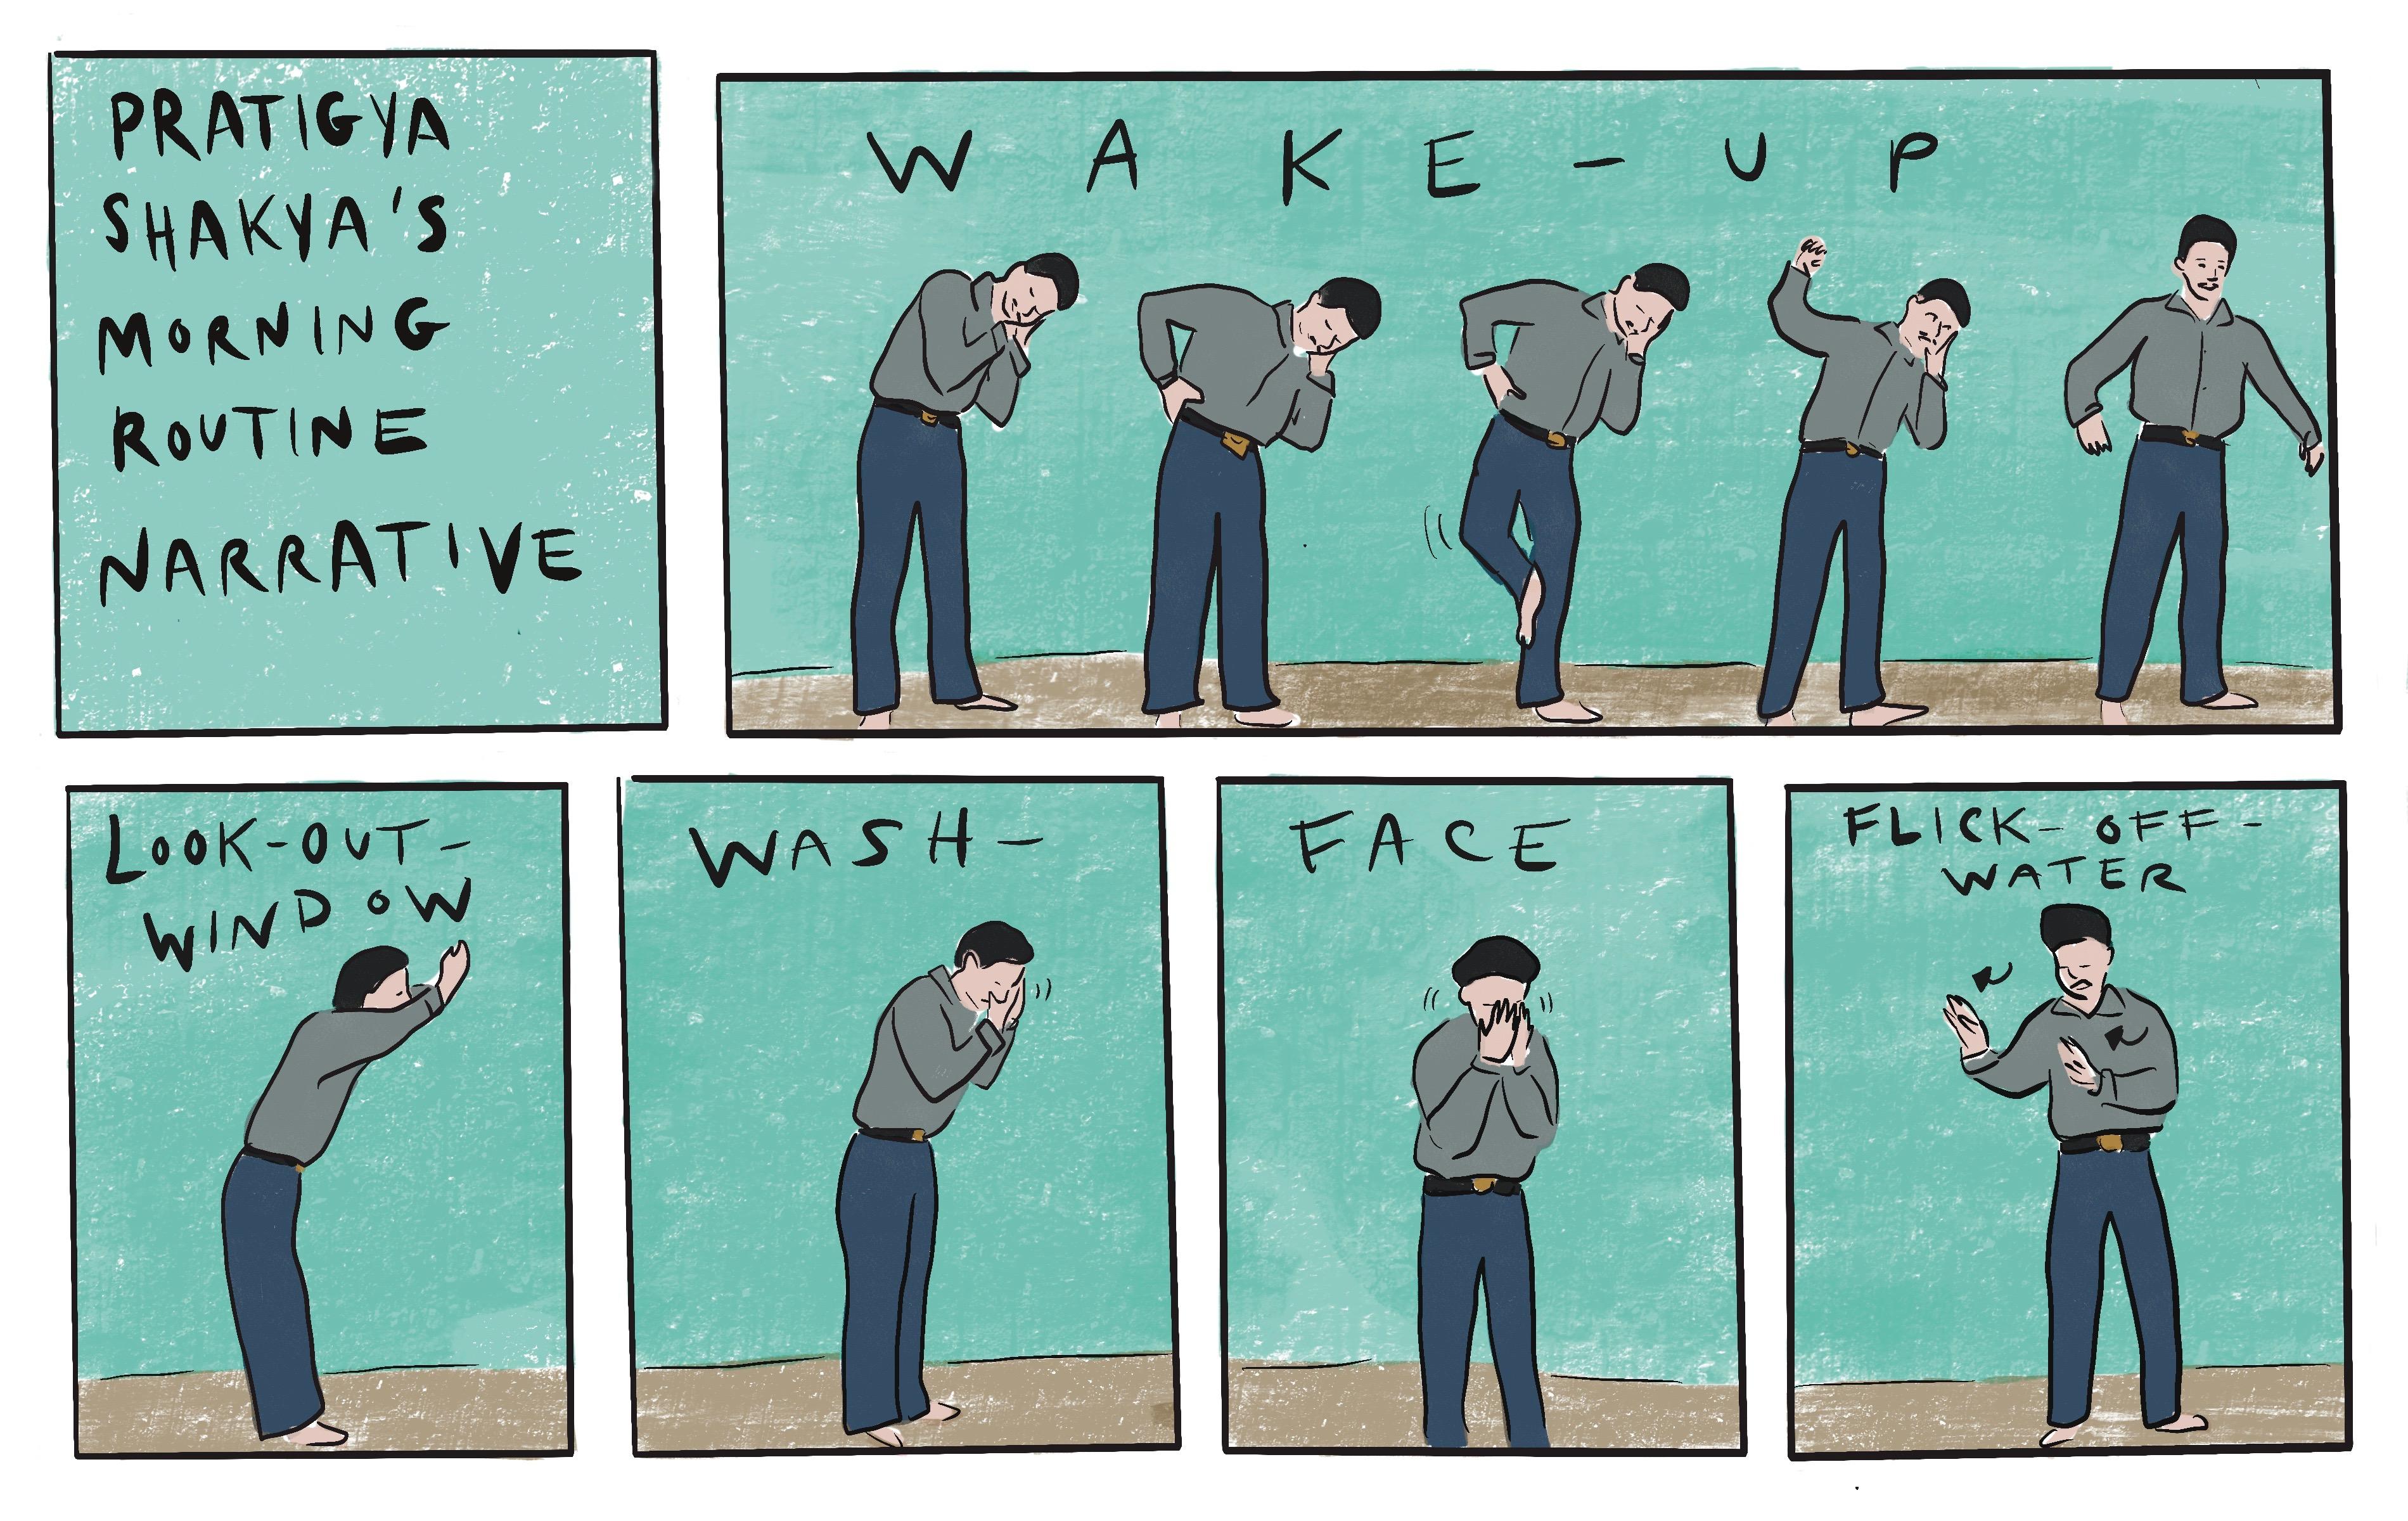 Figure 8. Pratiga Shakhya's Morning Routine Narrative. Illustrations by the author.